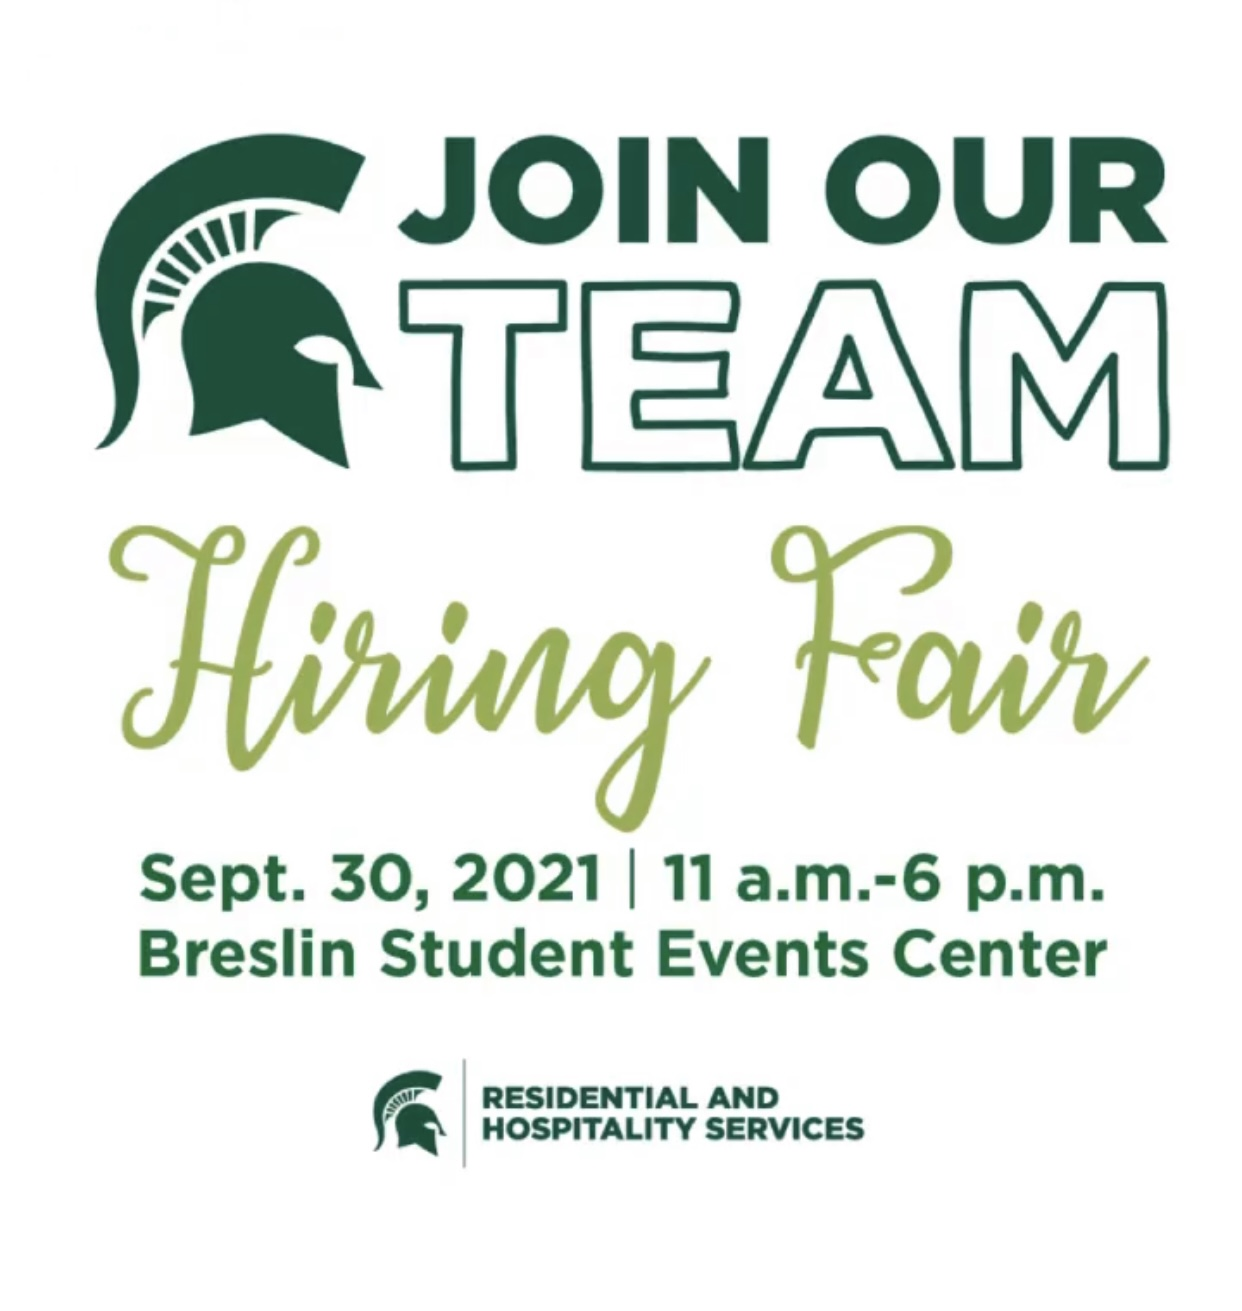 MSU Hiring Fair @ Breslin Student Events Center